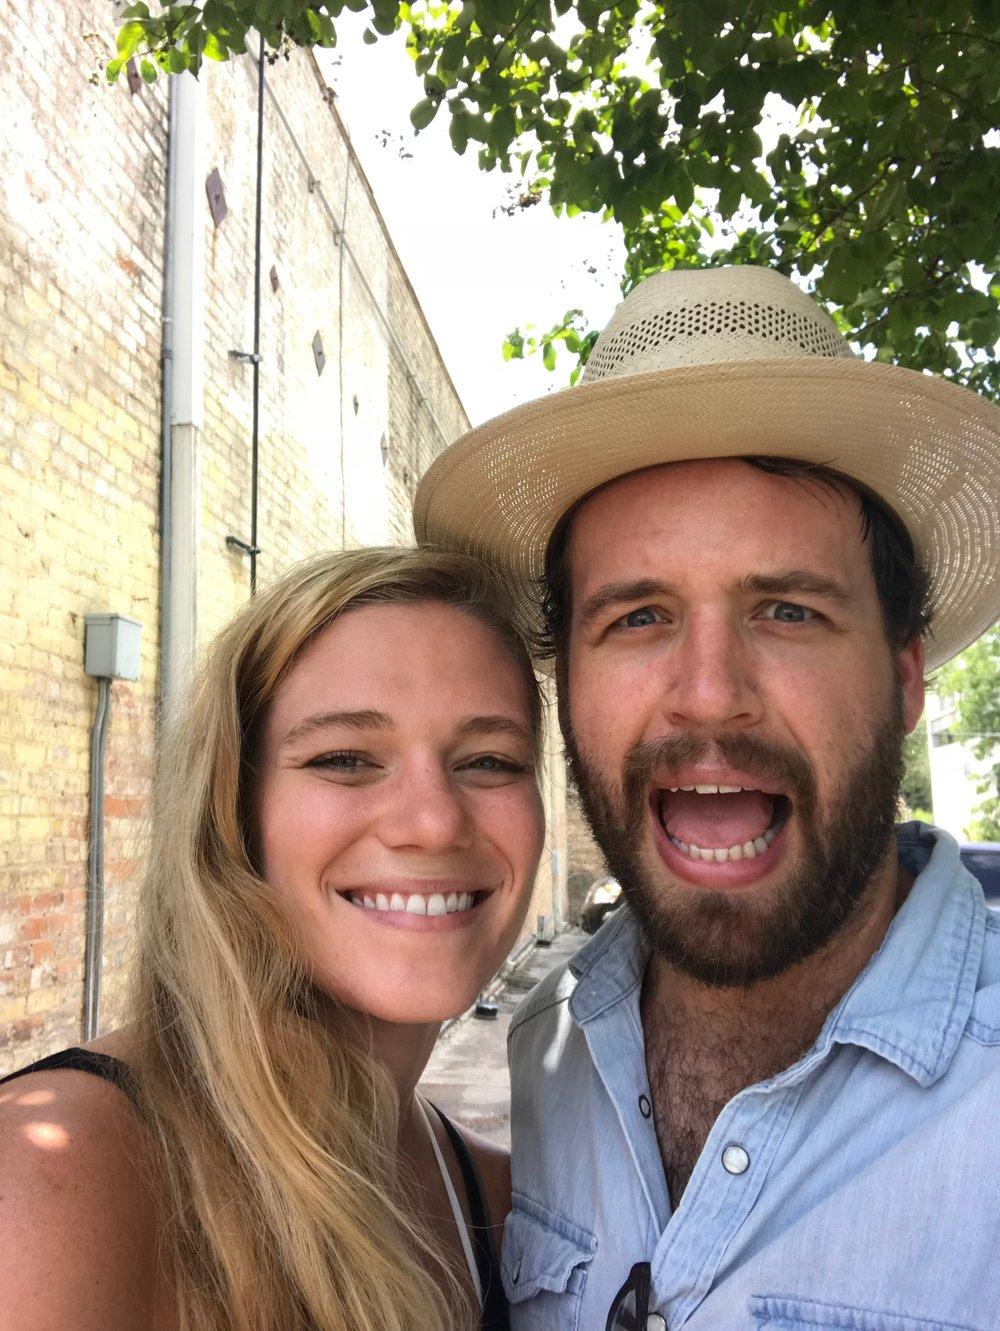 Jordan & I enjoying the blistering summer heat in Austin